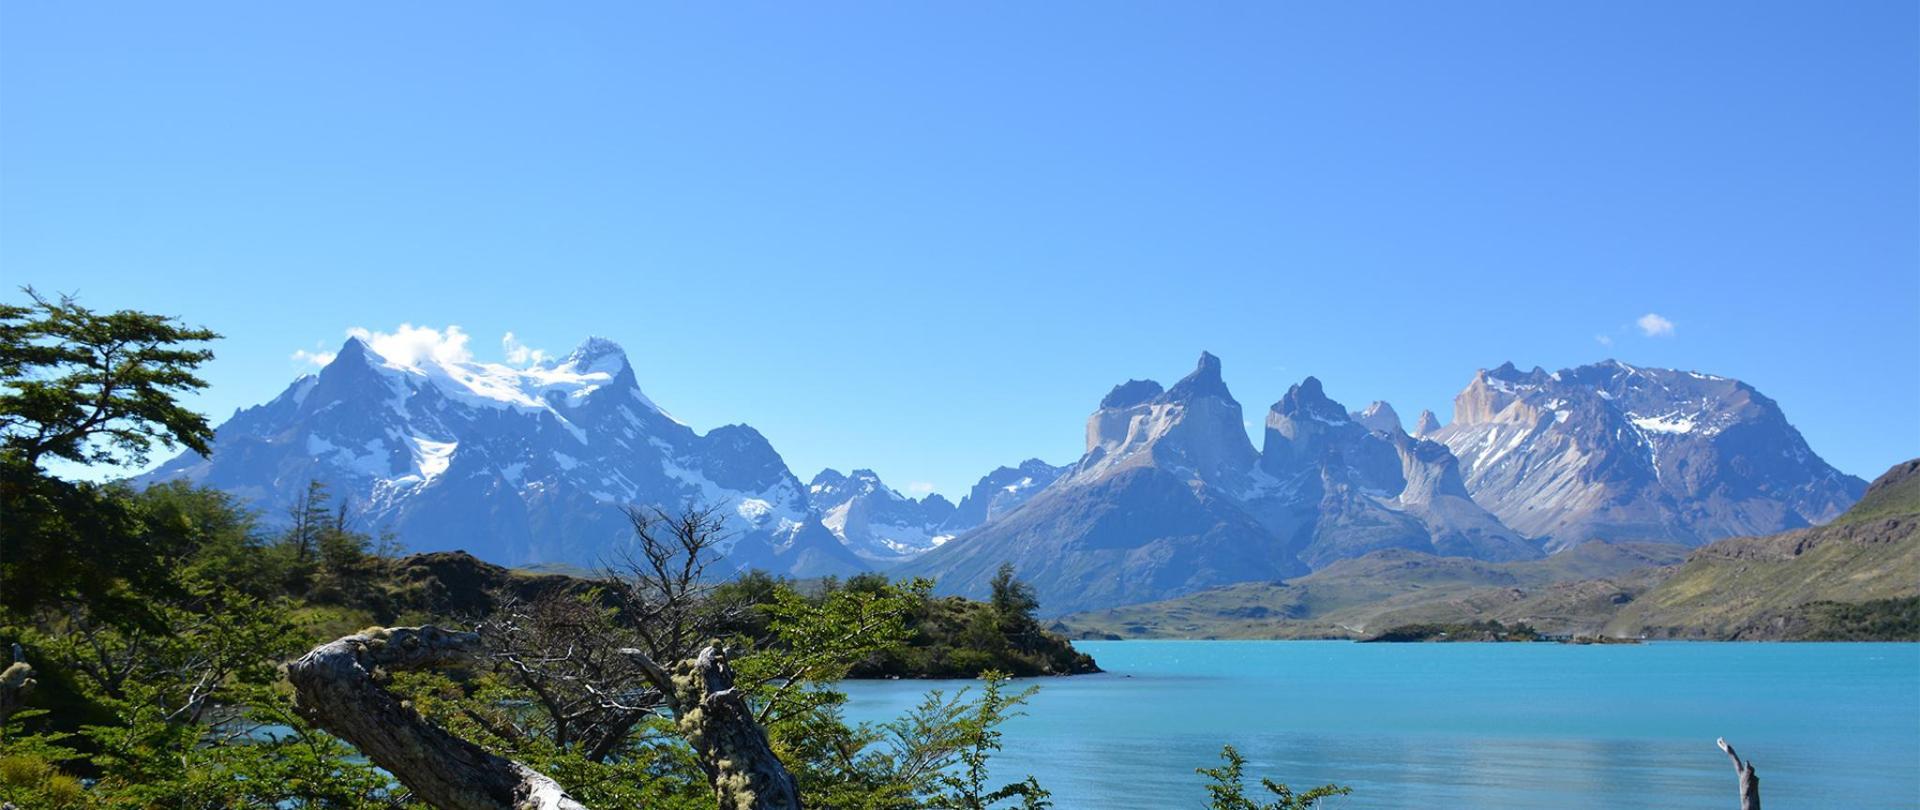 Torres-del-Paine-4.jpg